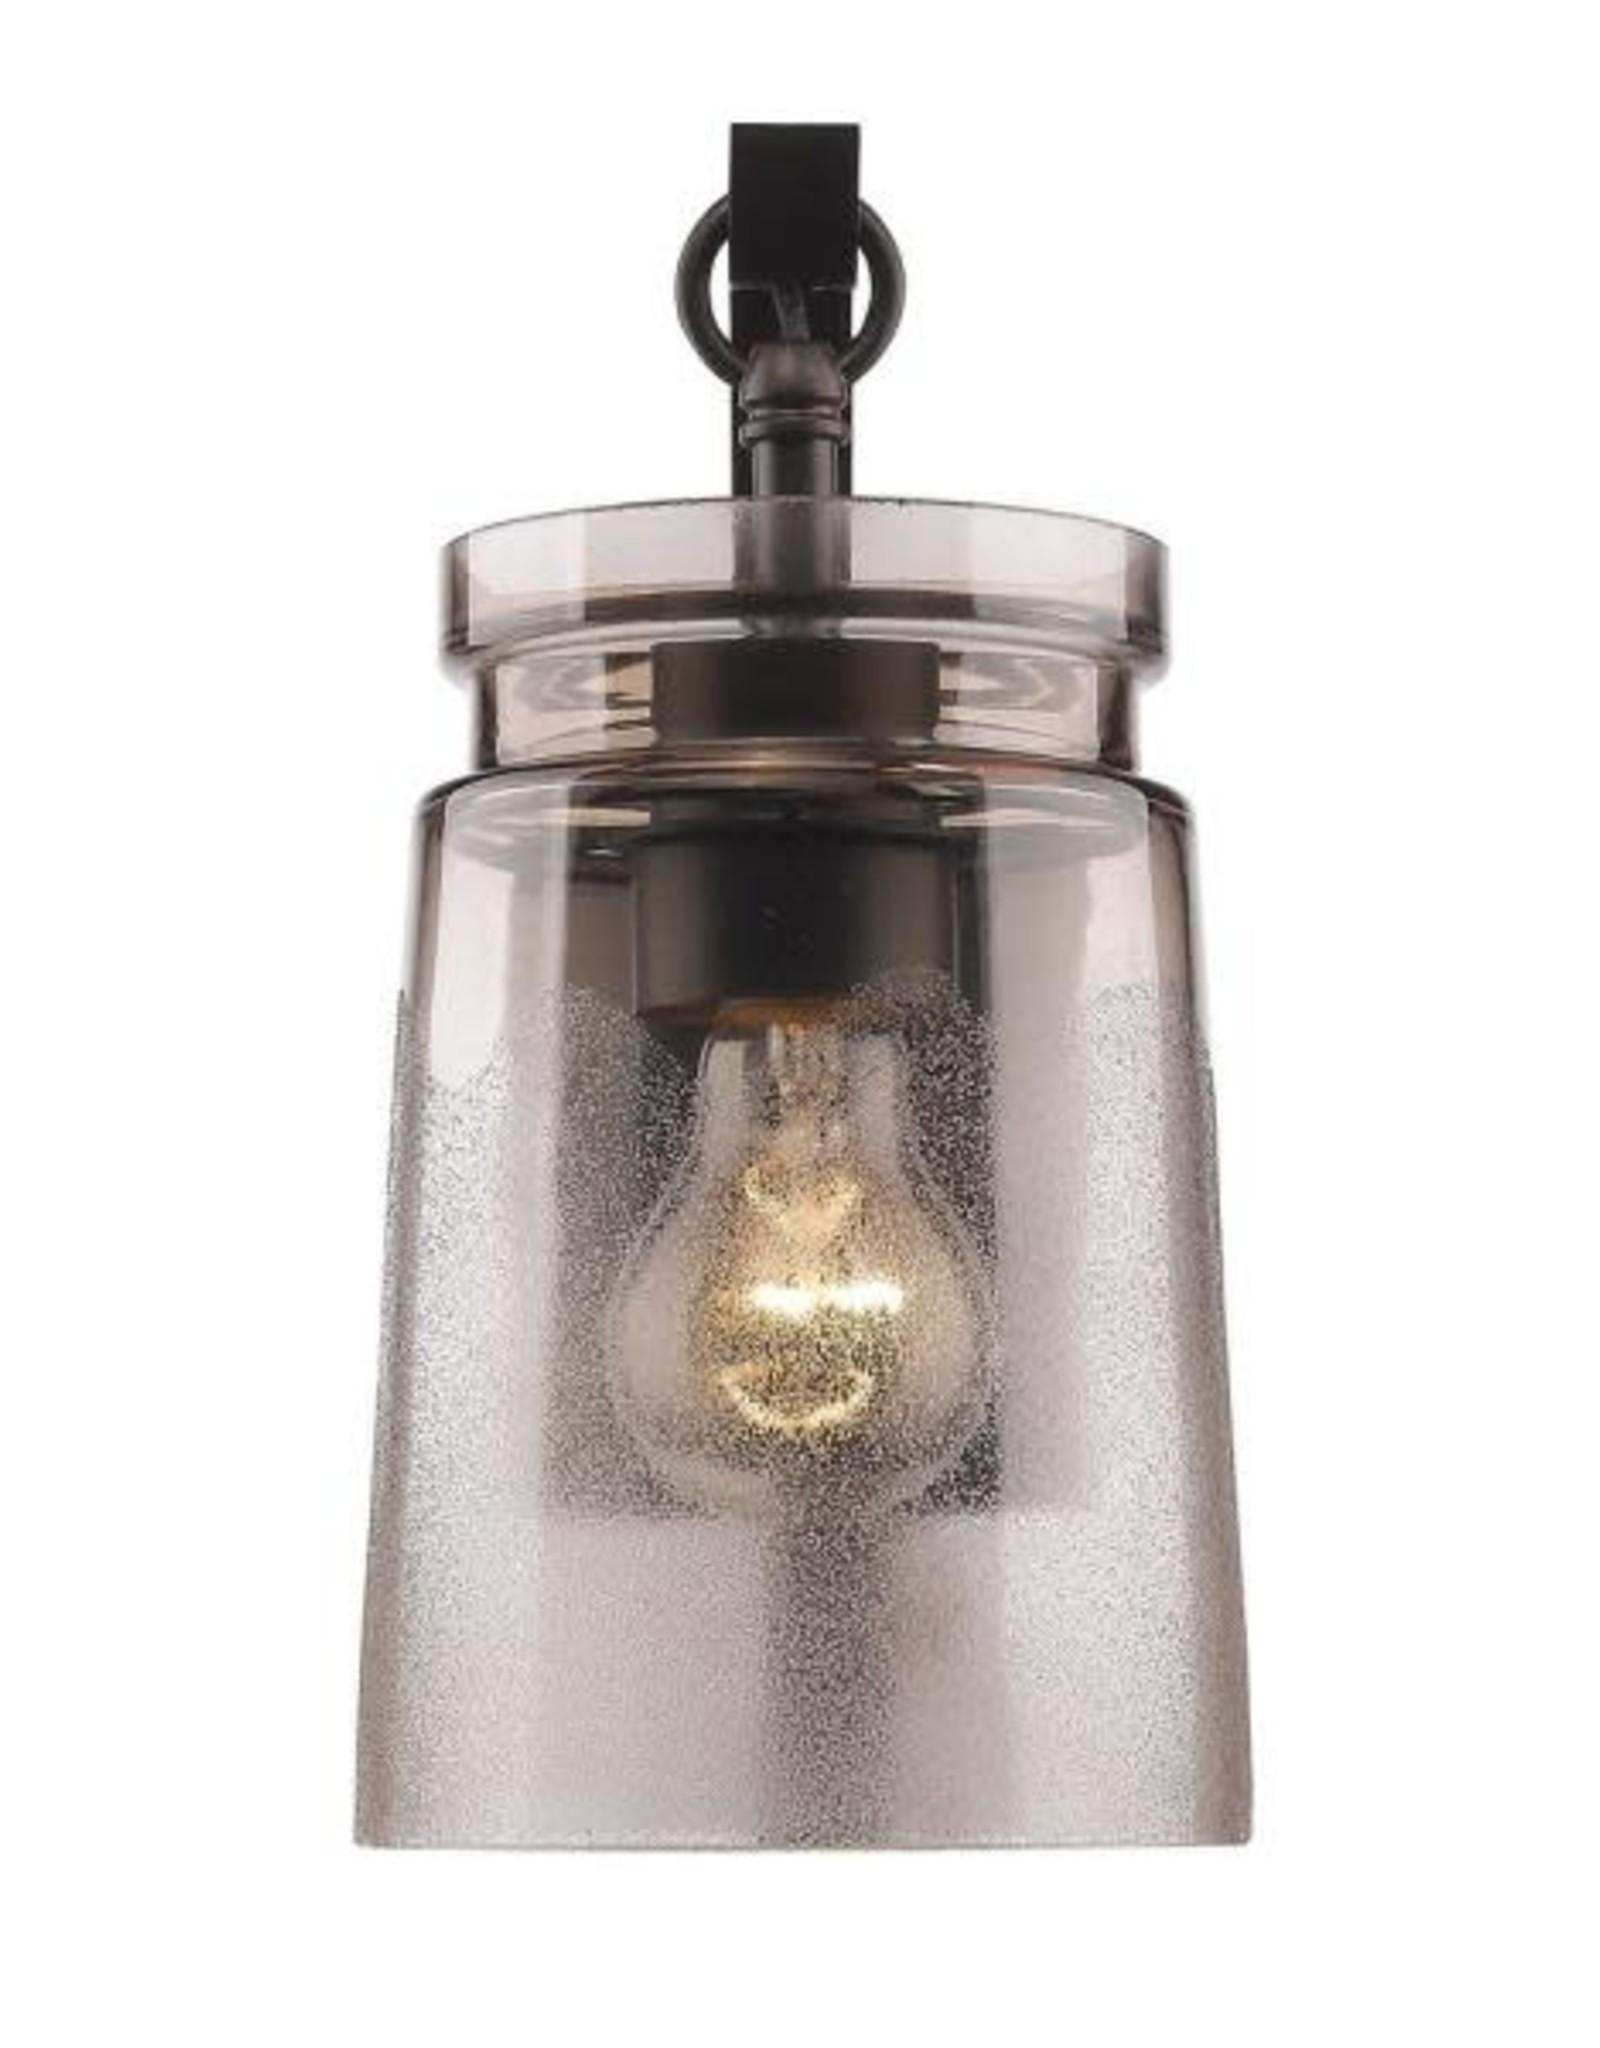 Golden Lighting Travers Rubbed Bronze 1-Light Bath Light